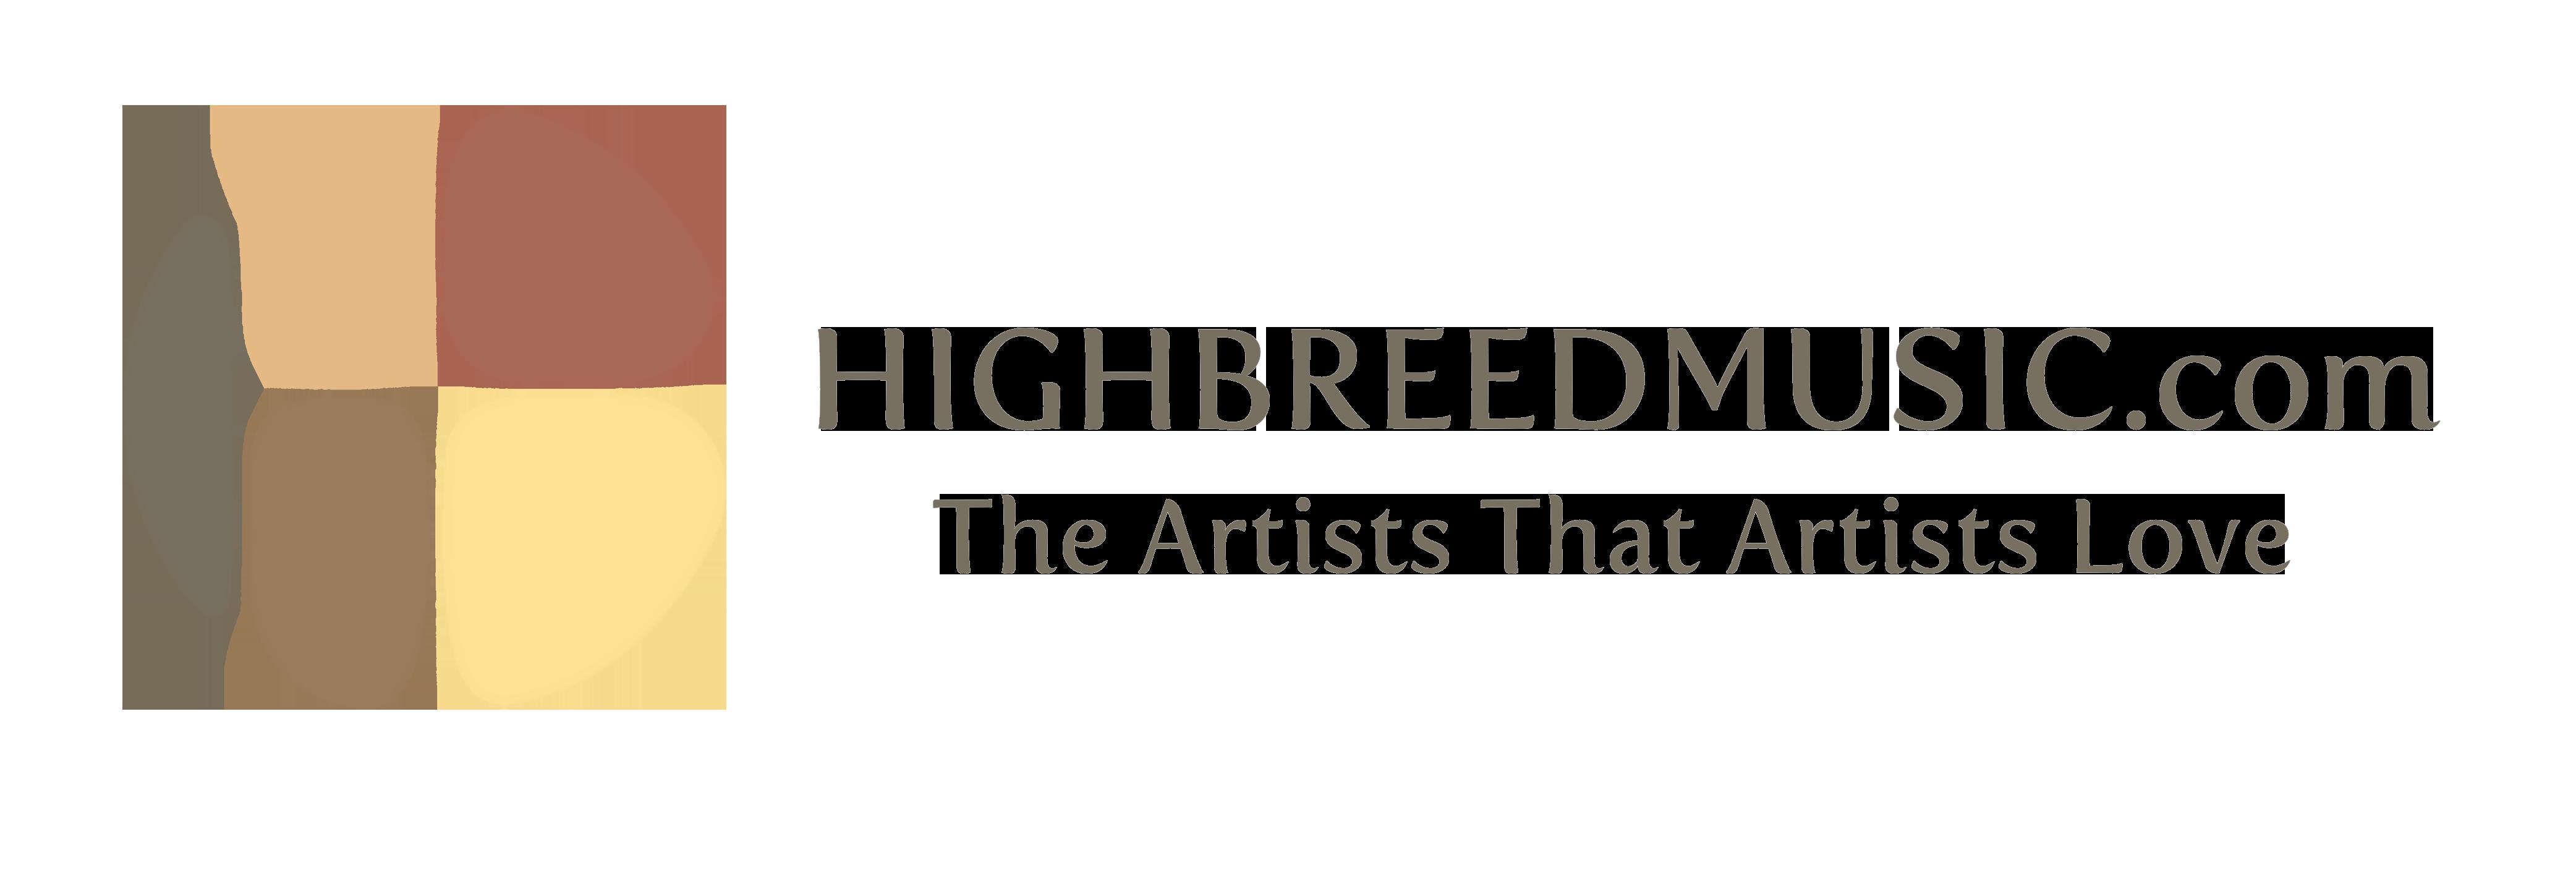 HBM logo and website with slogo